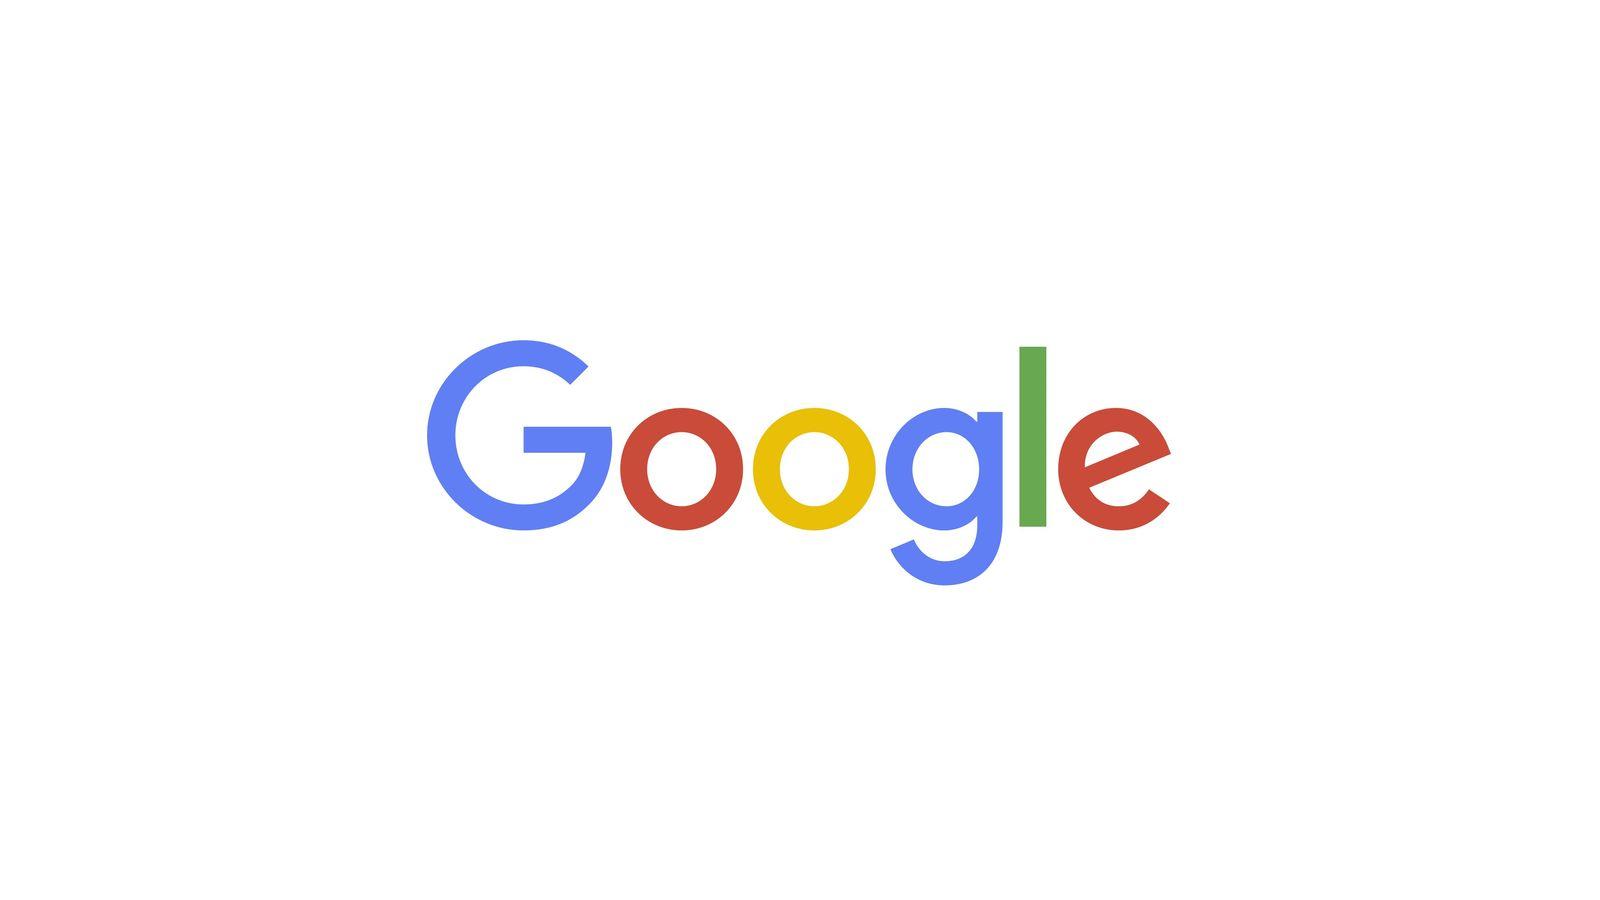 Google/Logo